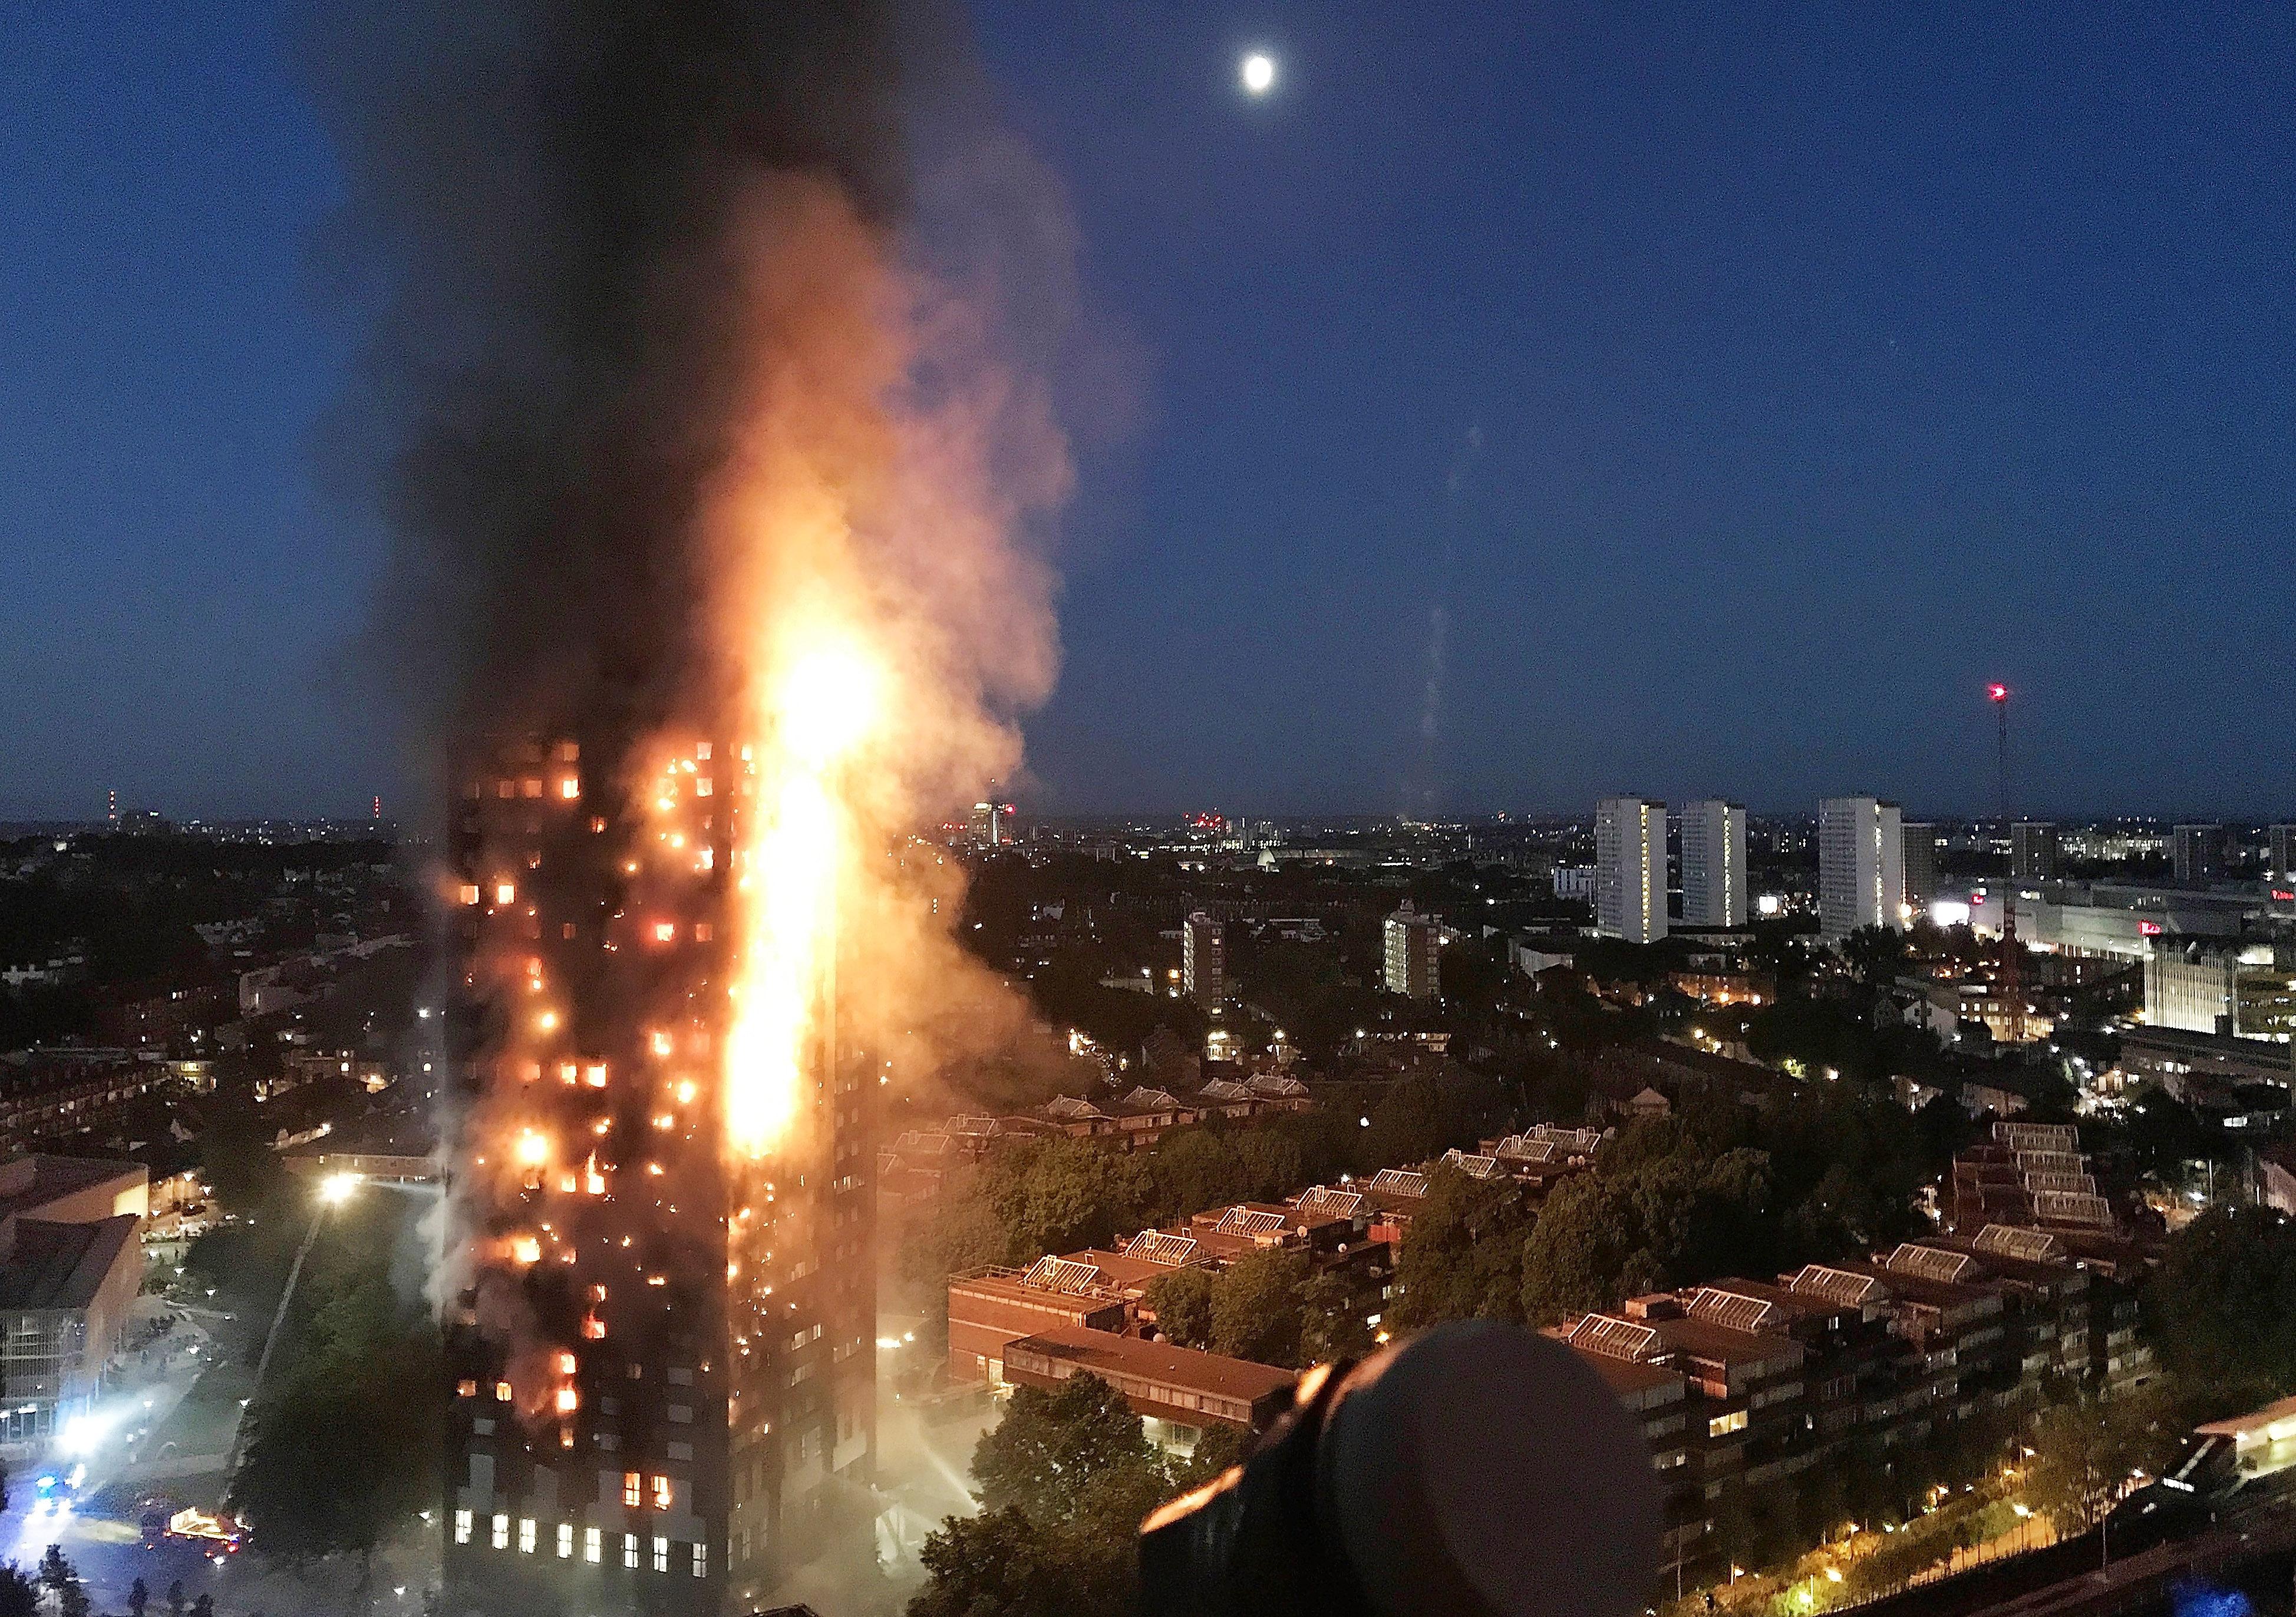 27-Storey Grenfell Tower Block On Fire In West London